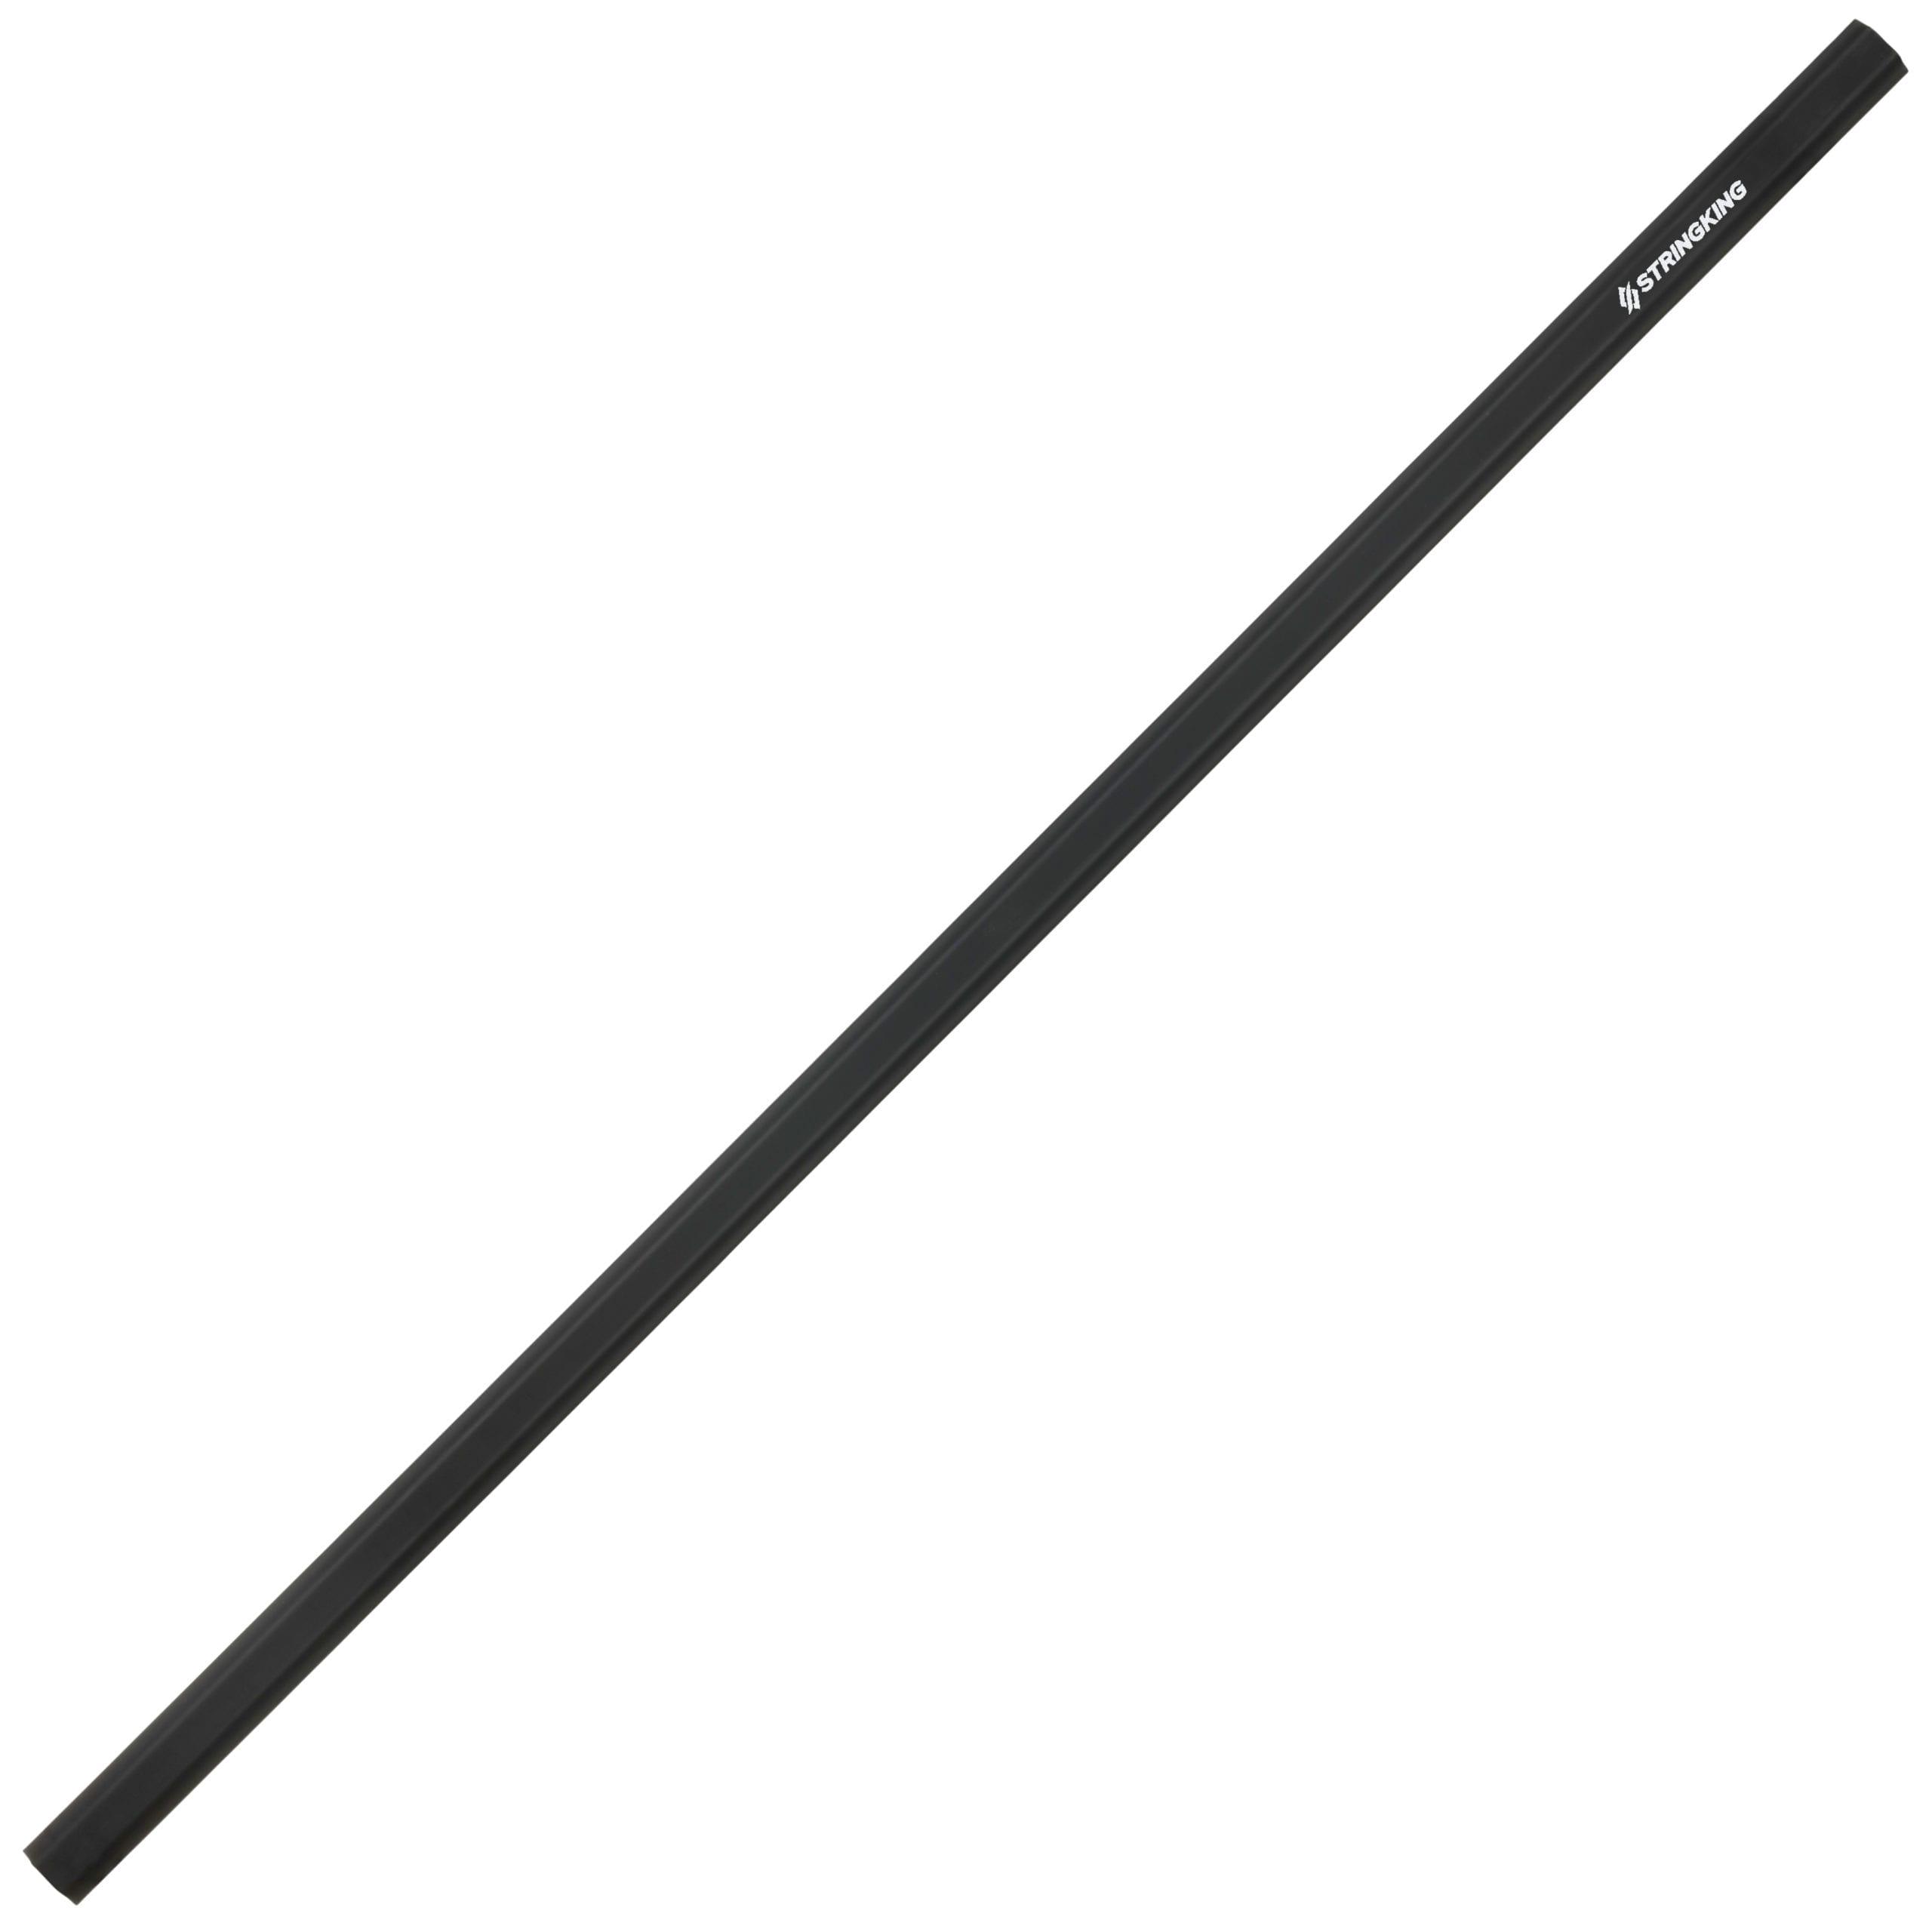 StringKing-Womens-Metal-3-Pro-Lacrosse-Shaft-Black-Full-Shaft-View-scaled-1.jpg